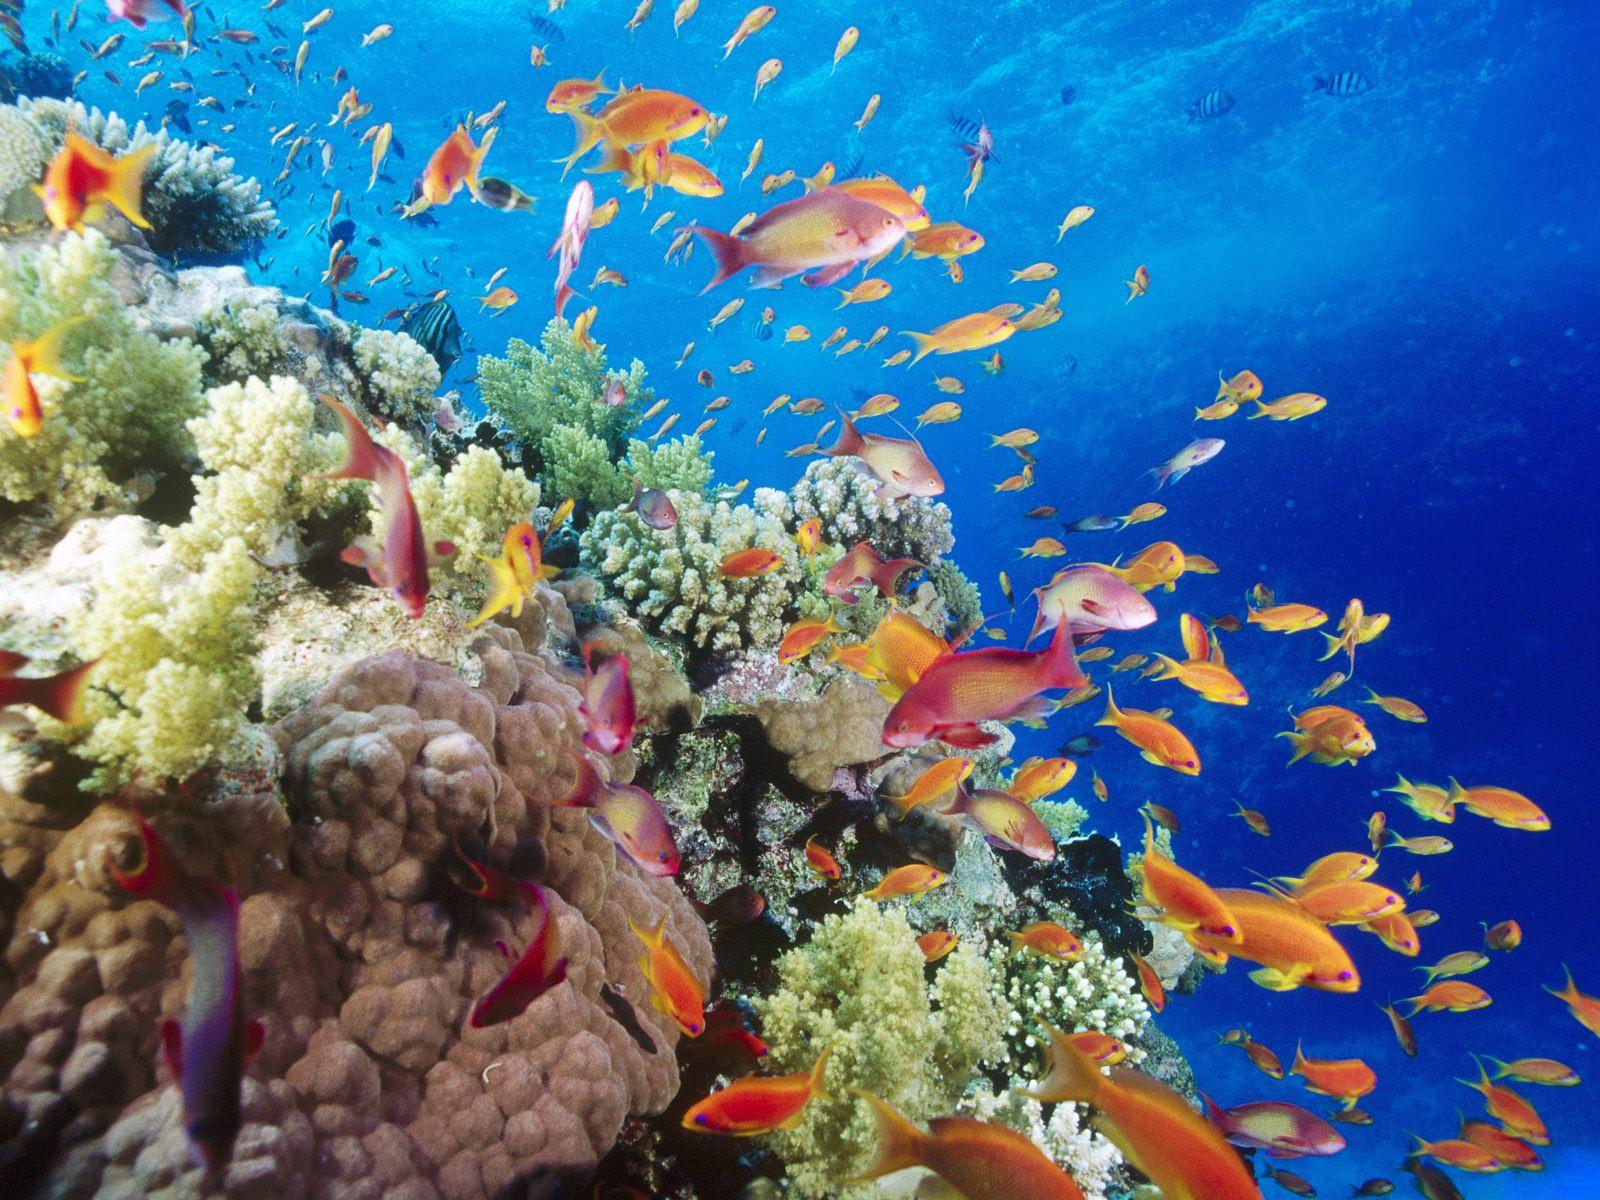 Wallpaper: Under Water Wallpaper